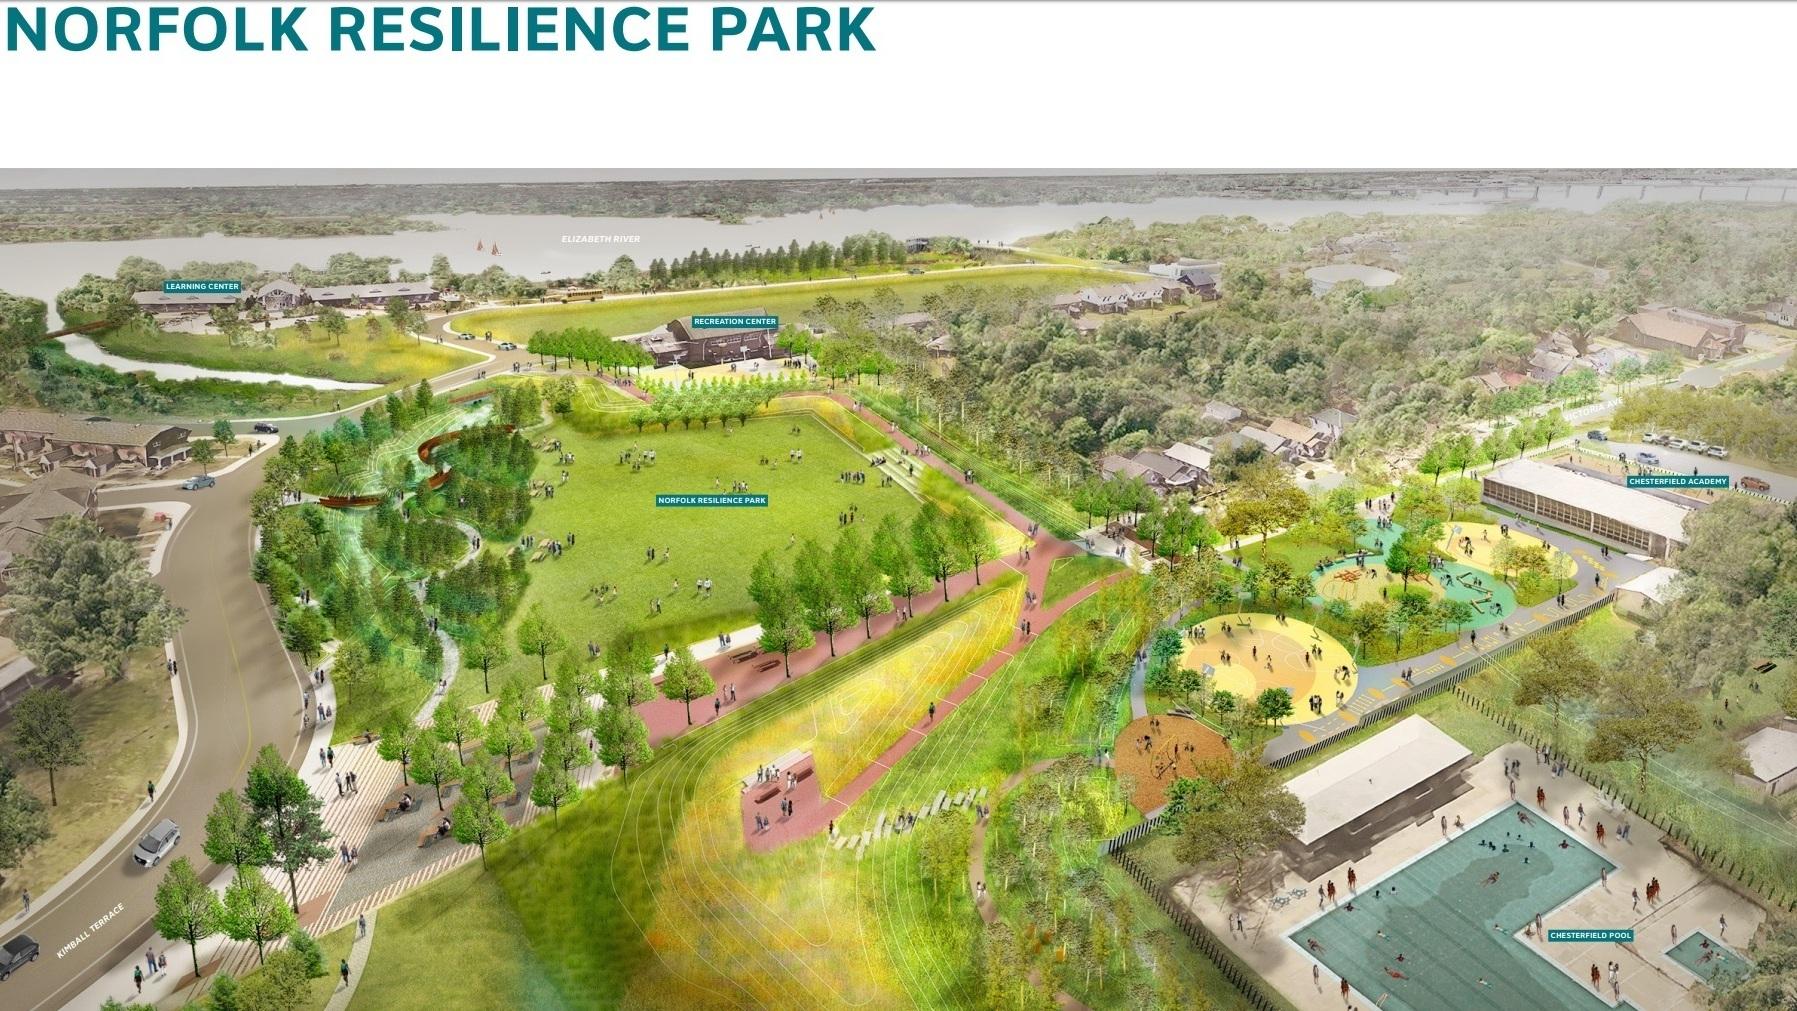 Norfolk_Resilience_Park_original.jpg